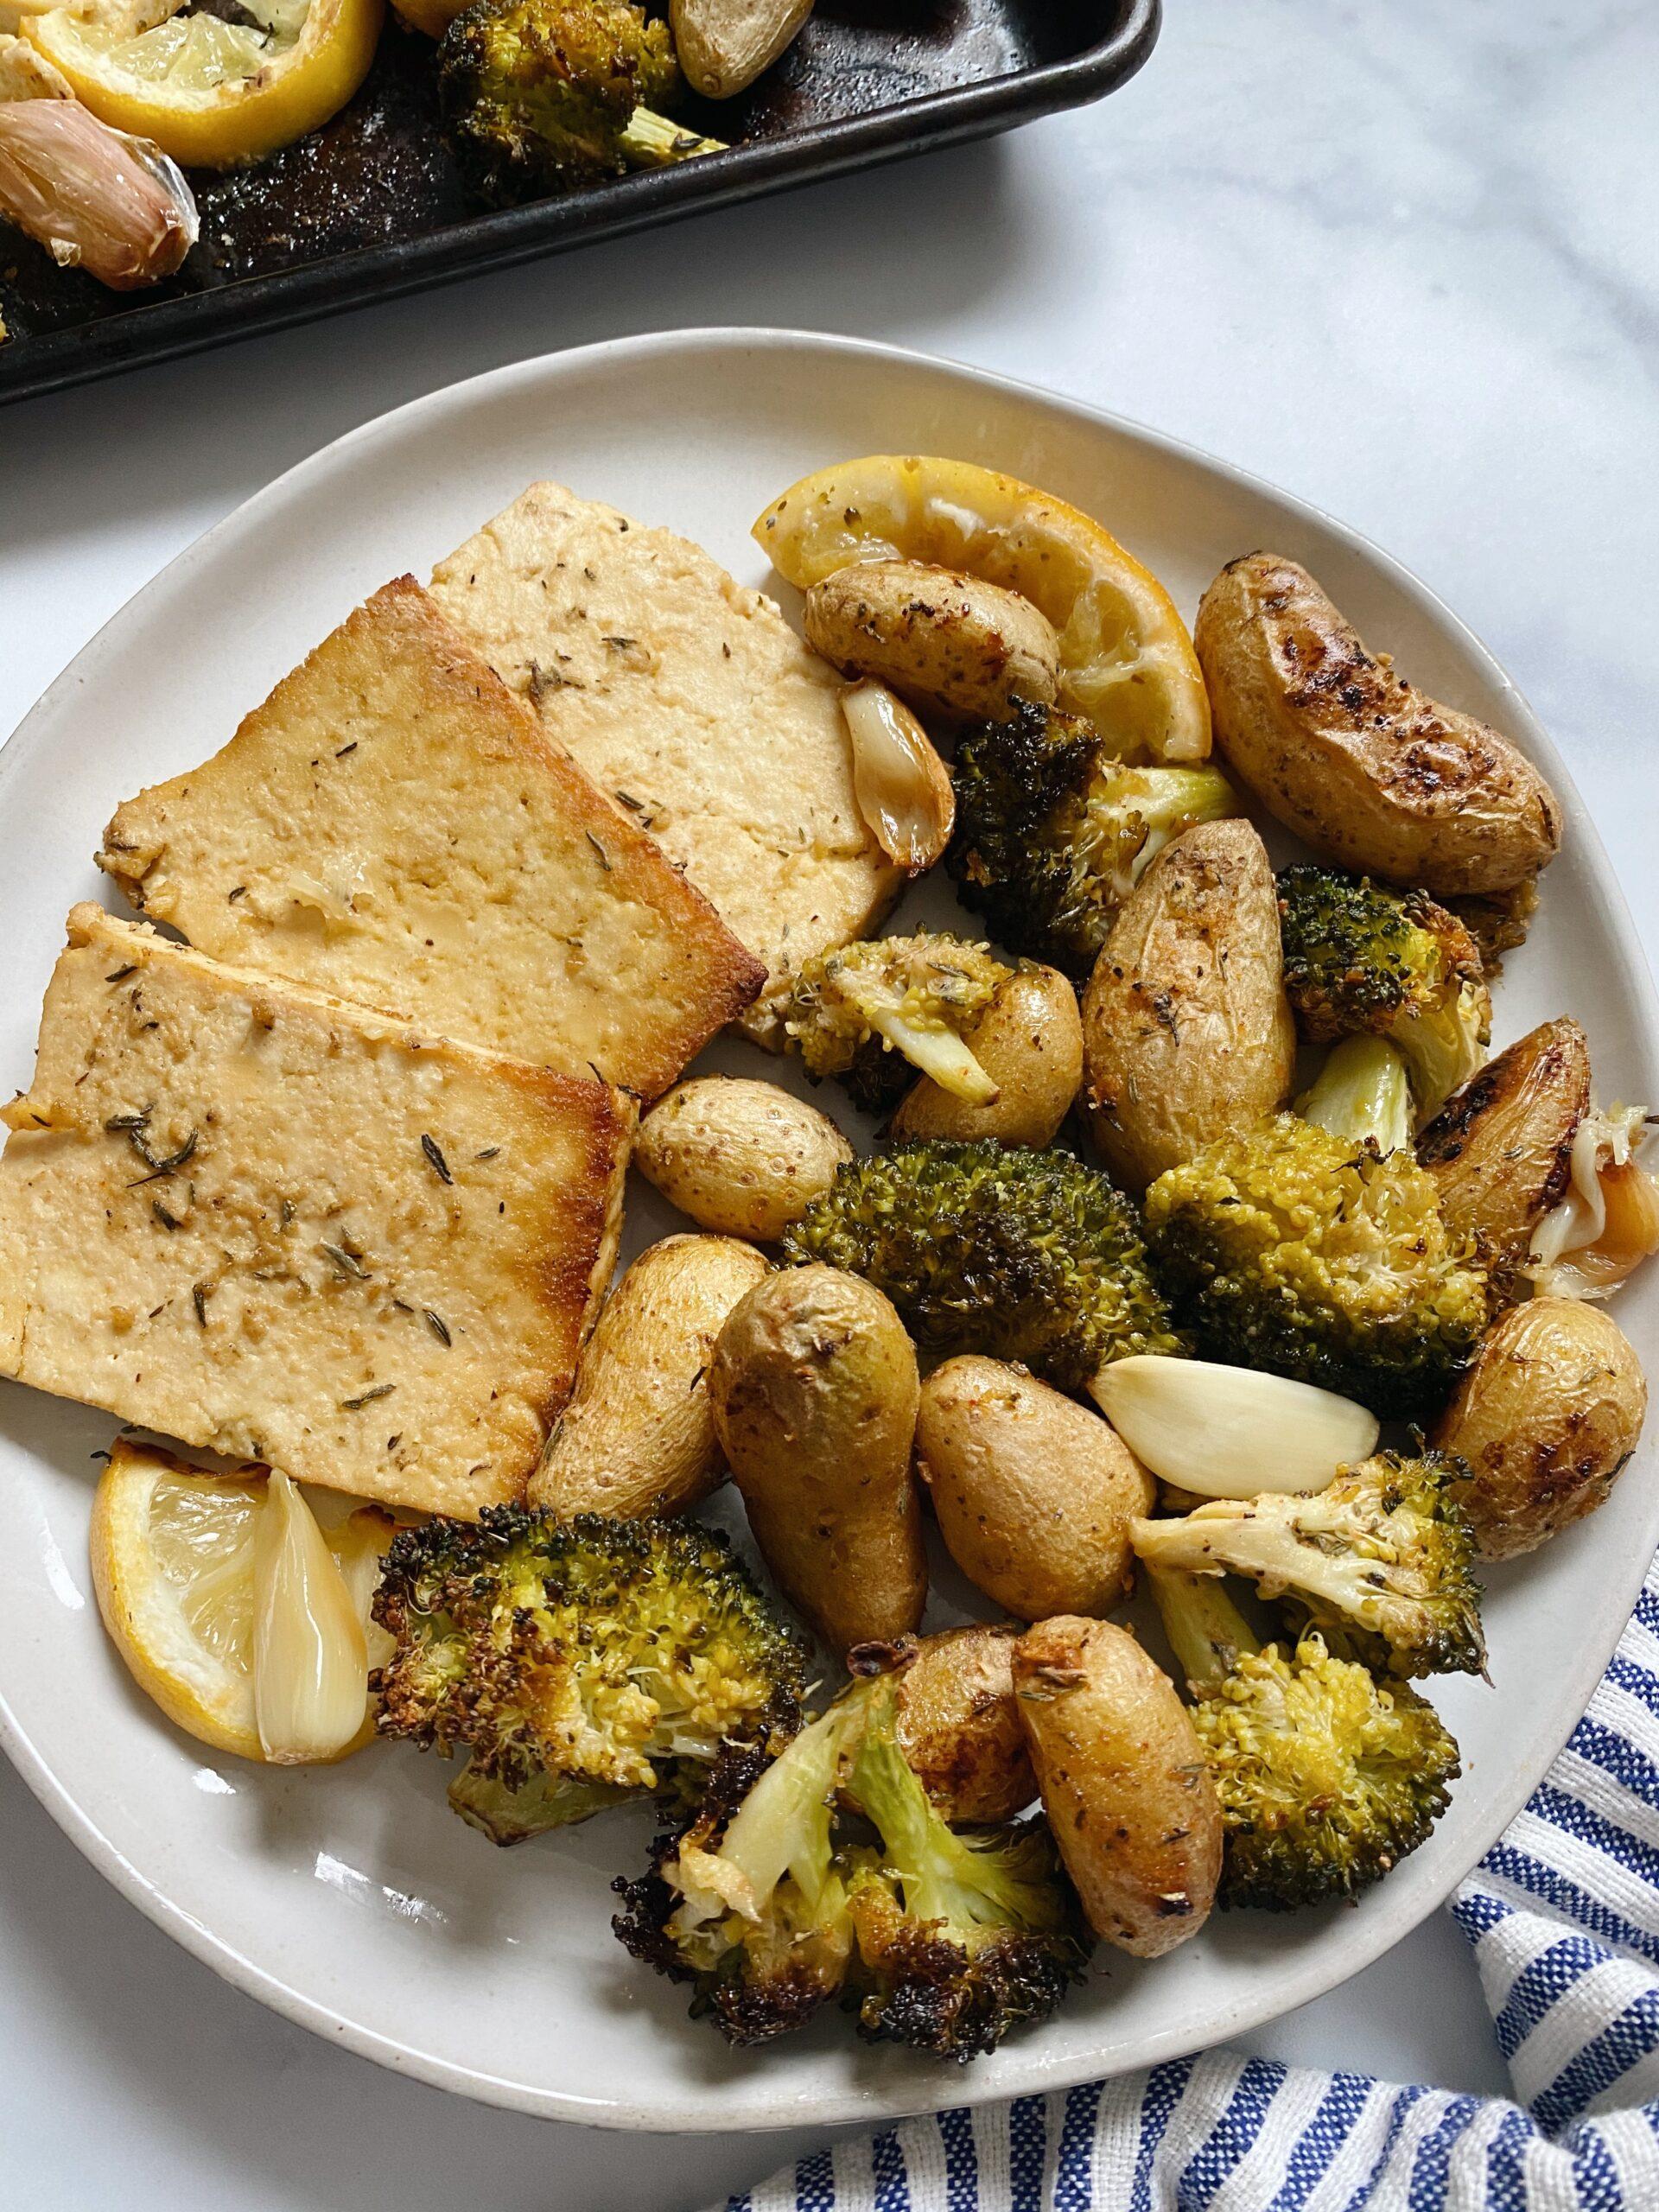 Sheet Pan Tofu, Potatoes & Broccoli